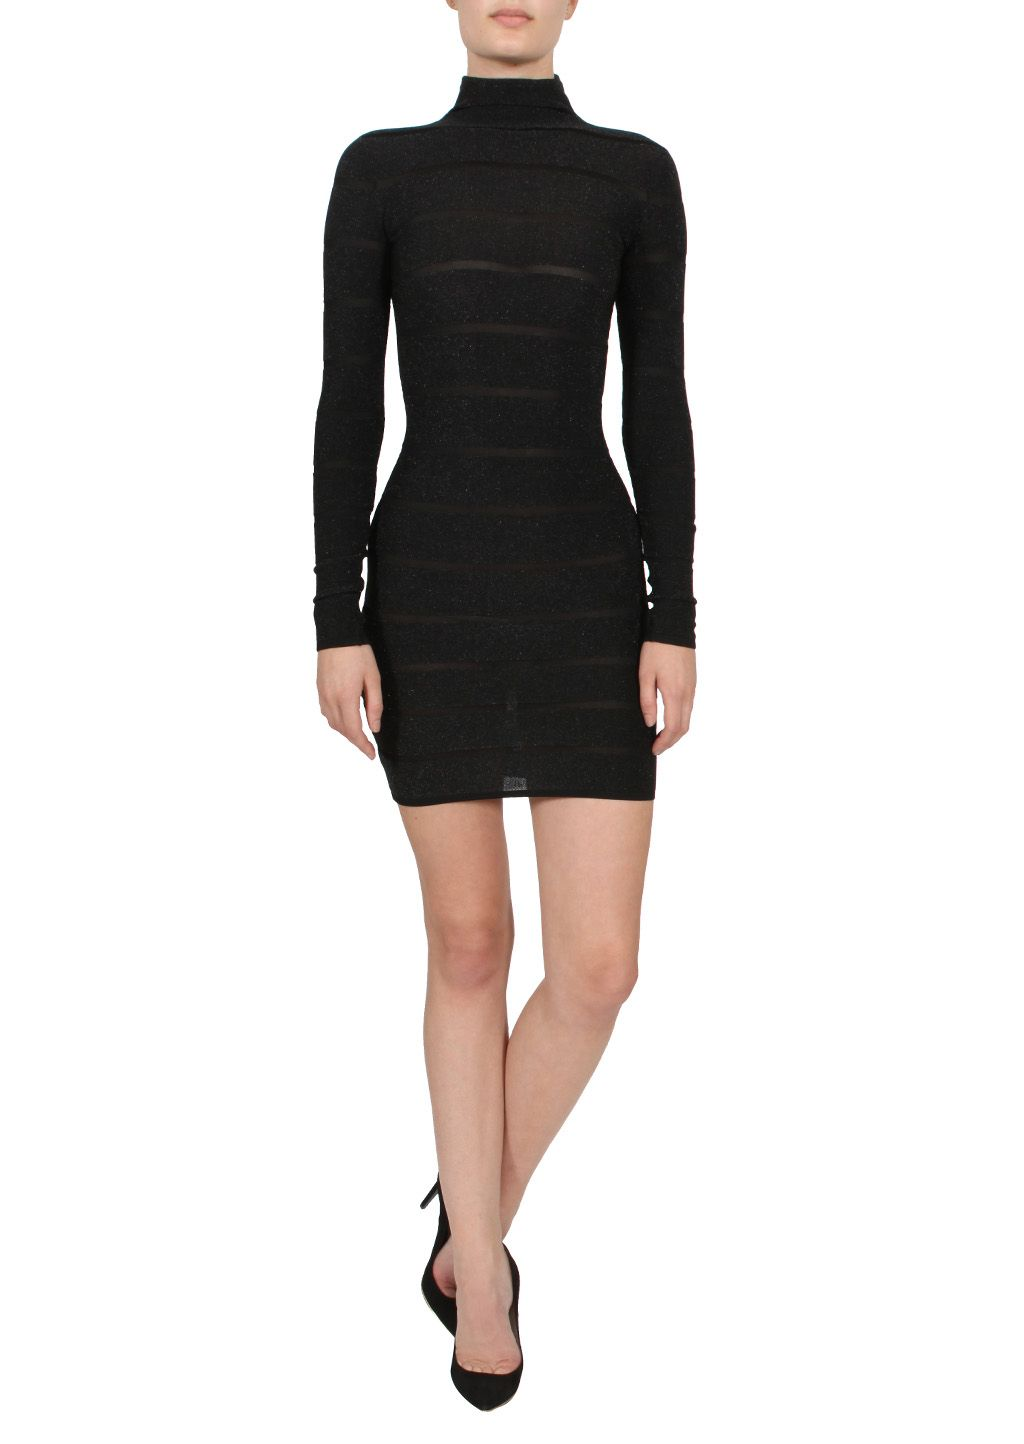 Balmain Dresses :: Balmain black lamé knit striped dress | Montaigne Market